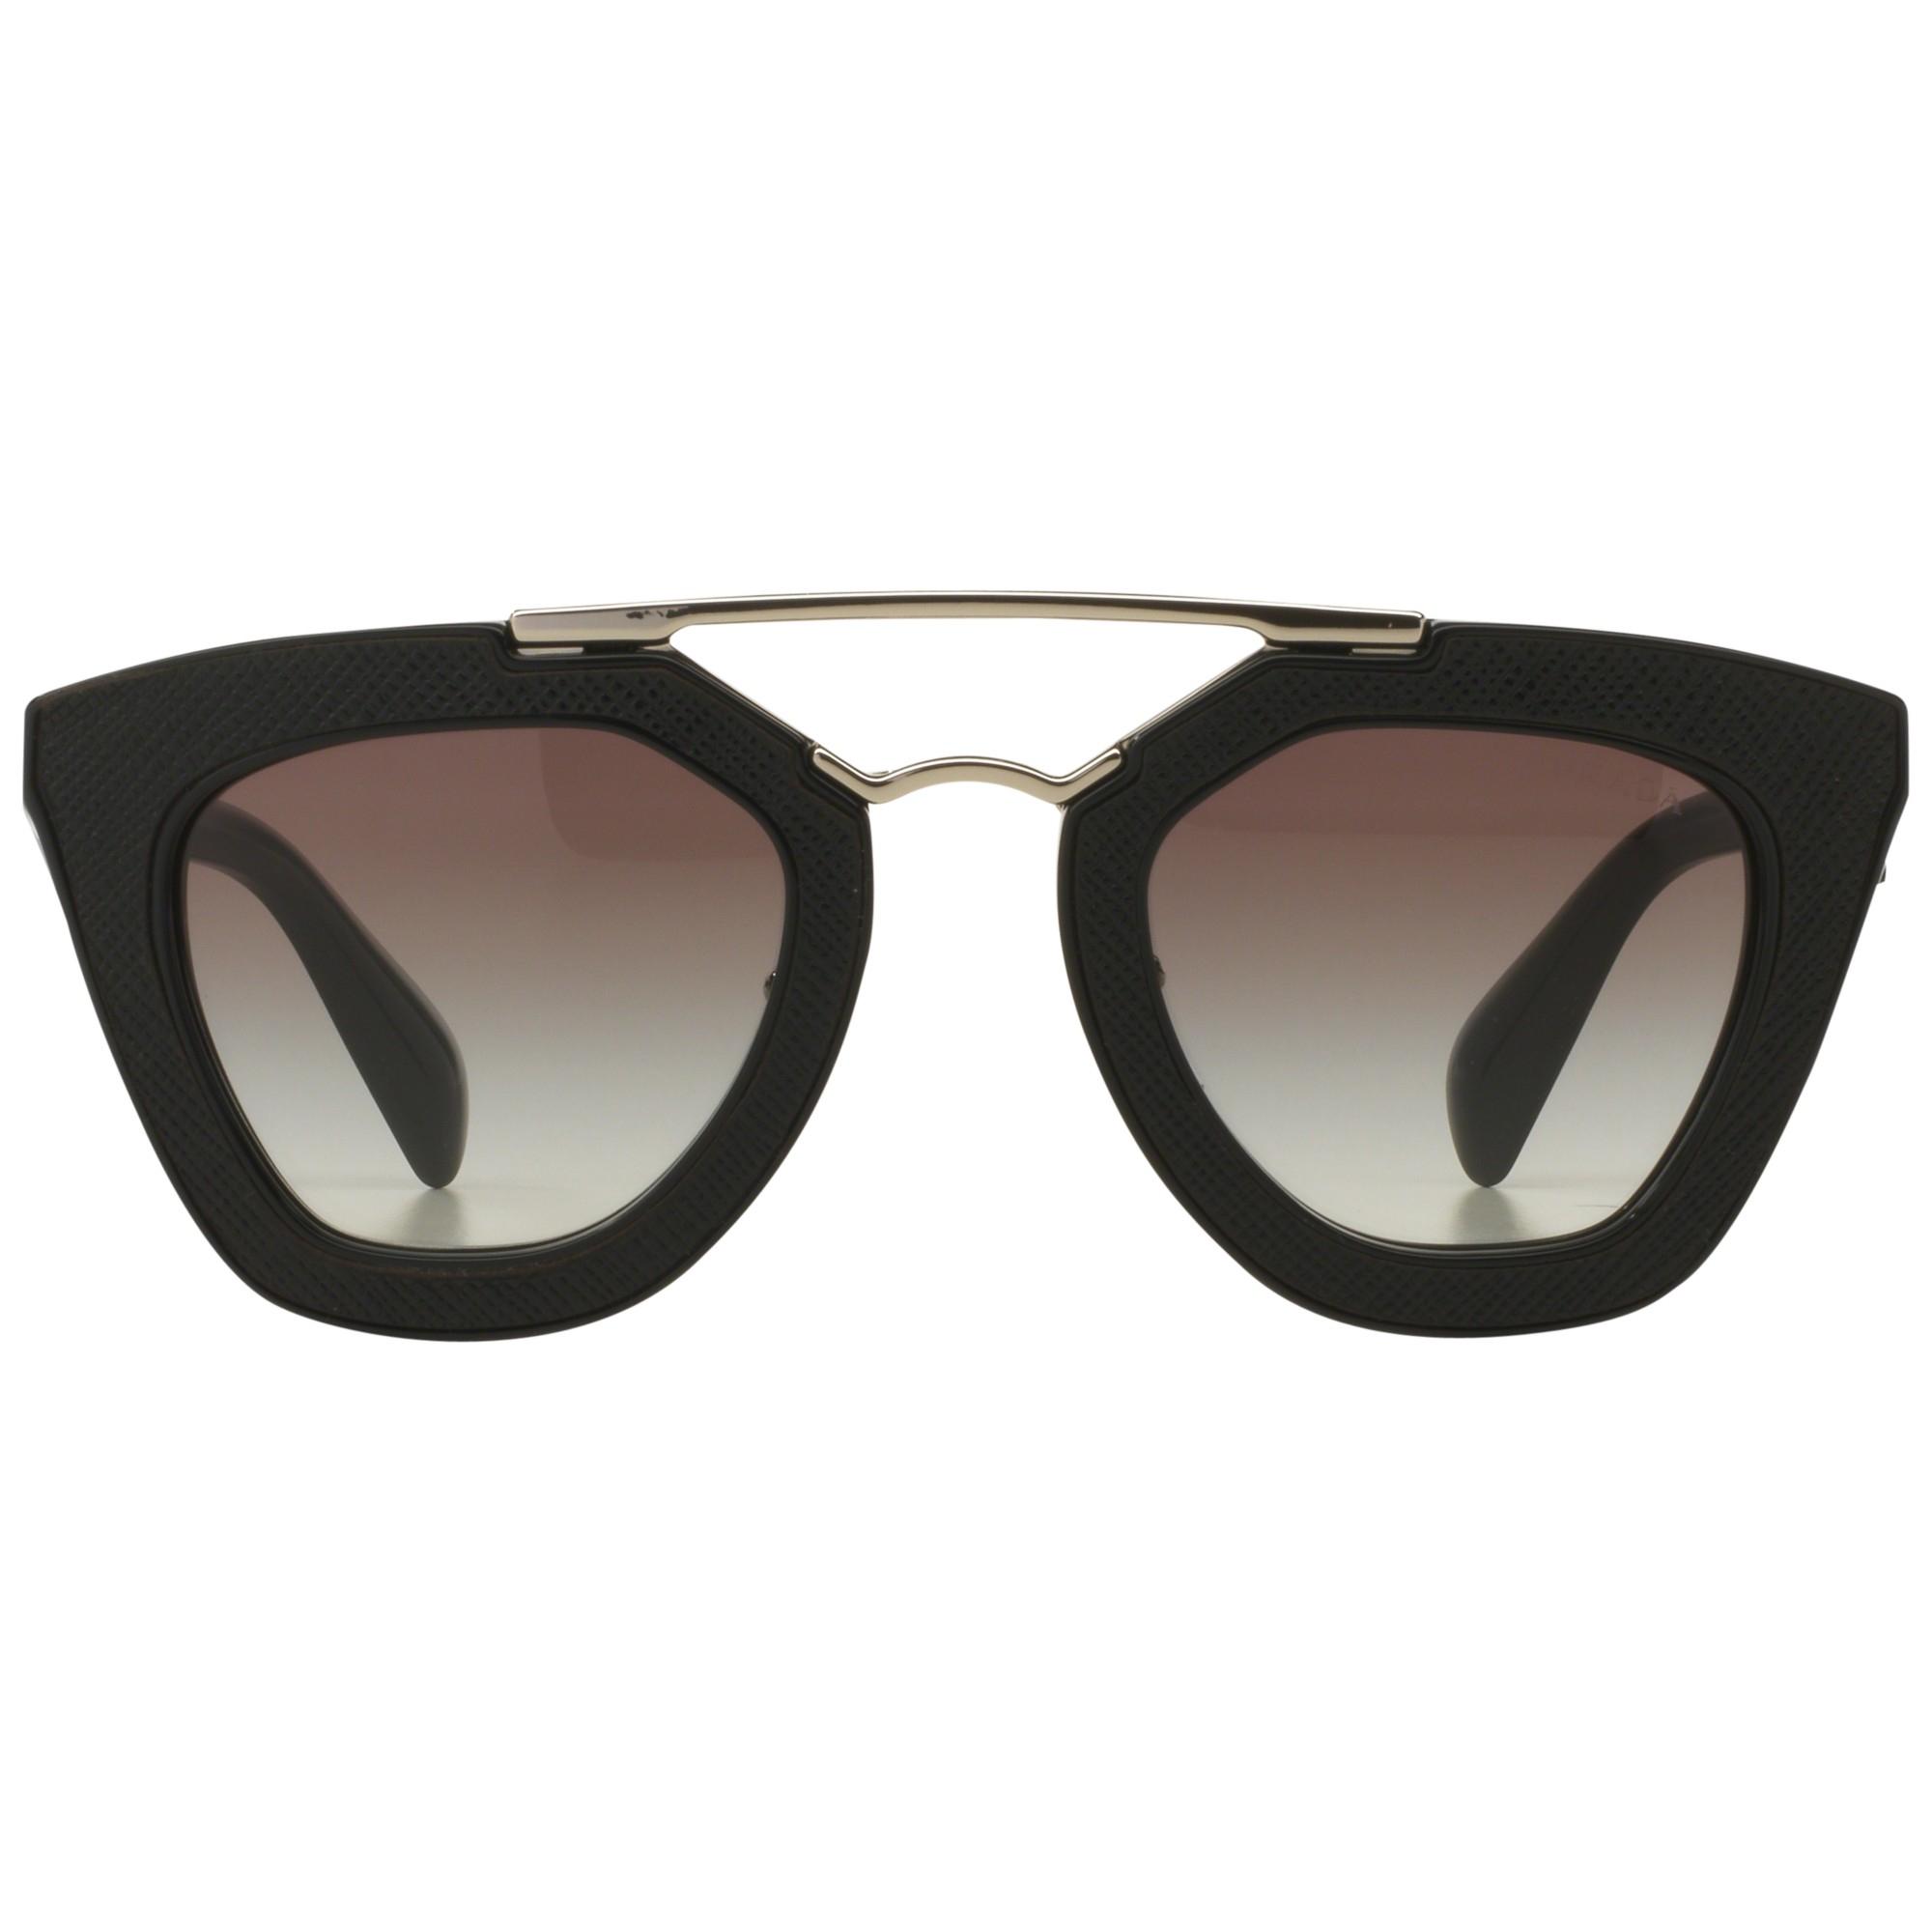 Prada Pr14ss D-frame Sunglasses in Black - Lyst